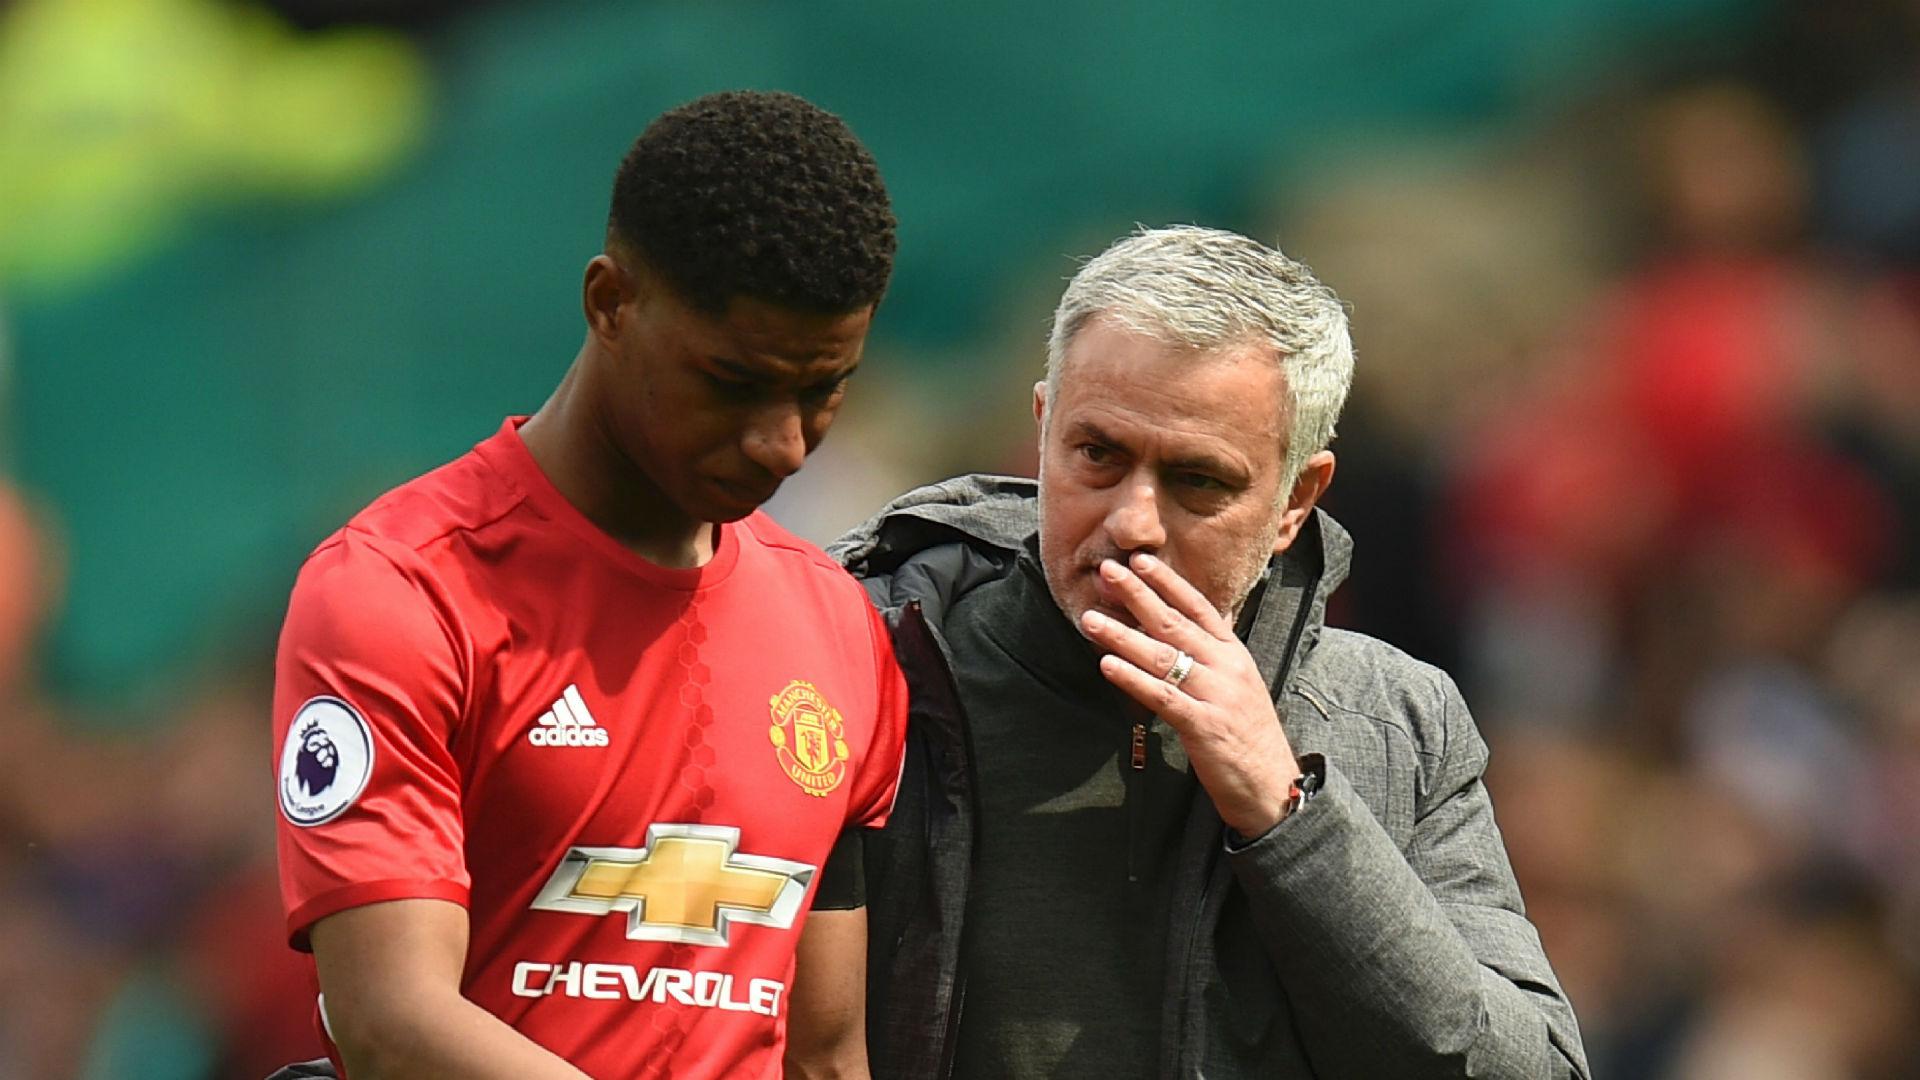 Marcus Rashford Jose Mourinho Manchester United